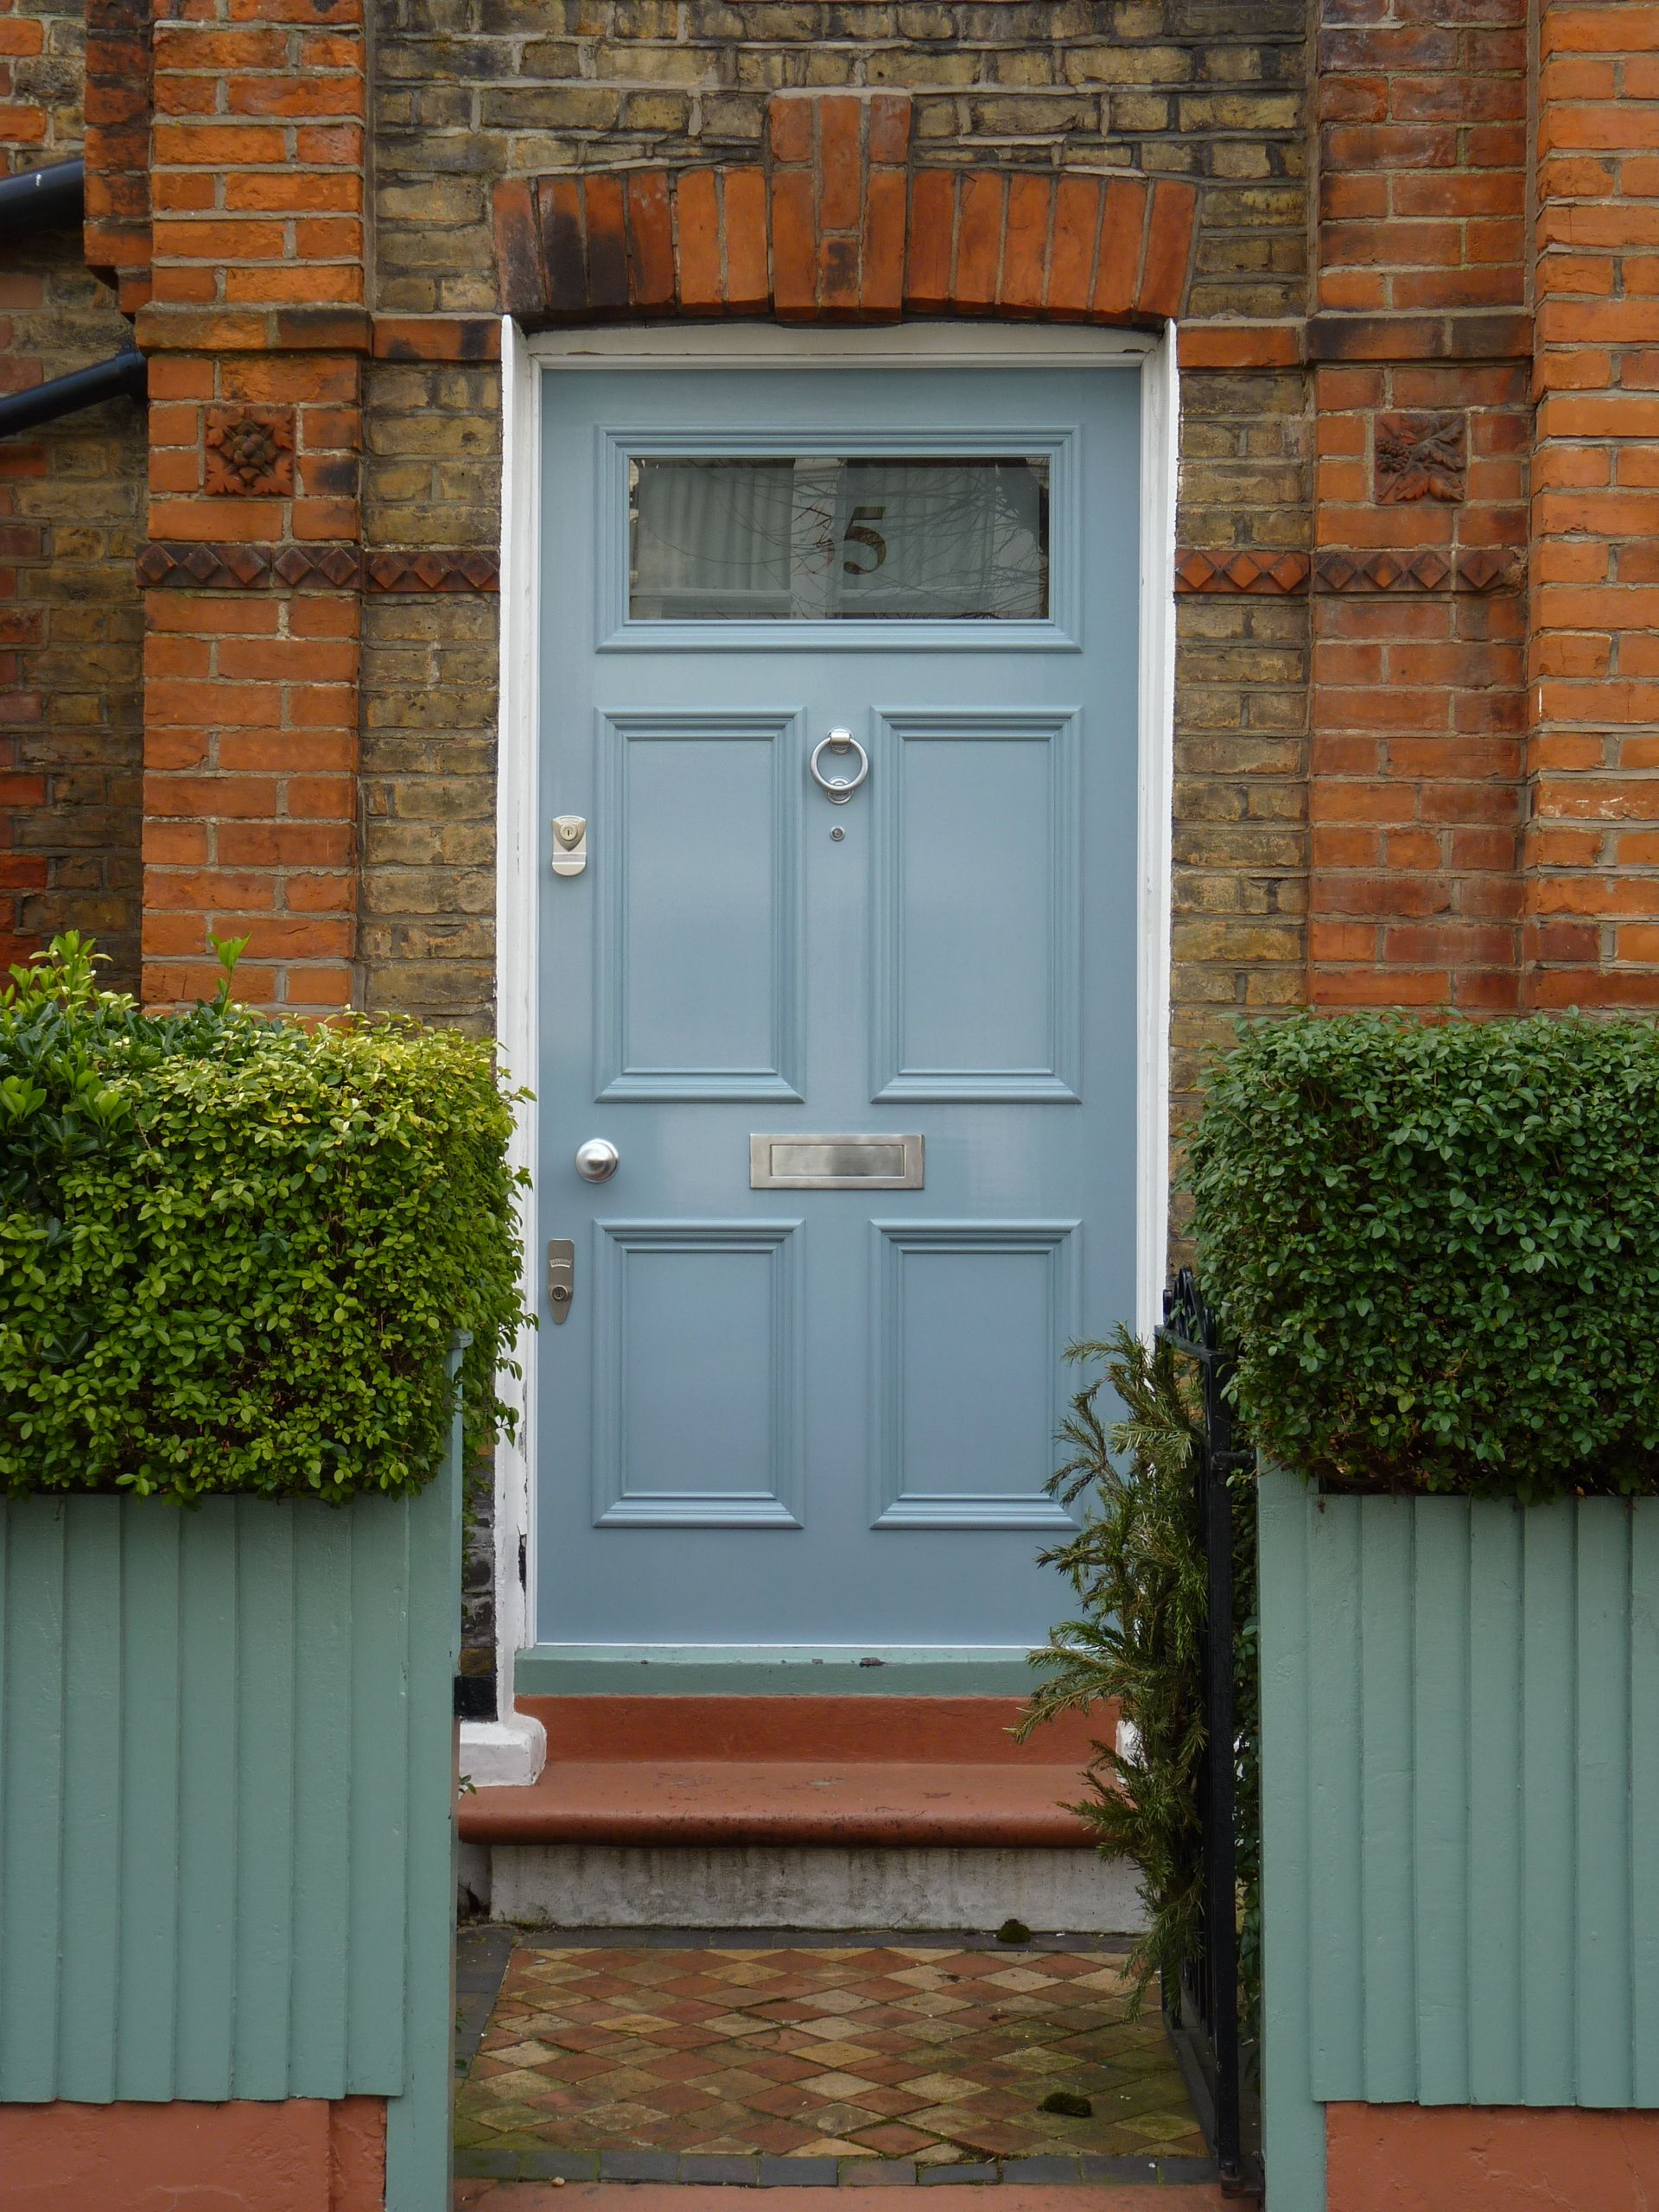 Blue victorian front door with banham locks in 2020 with